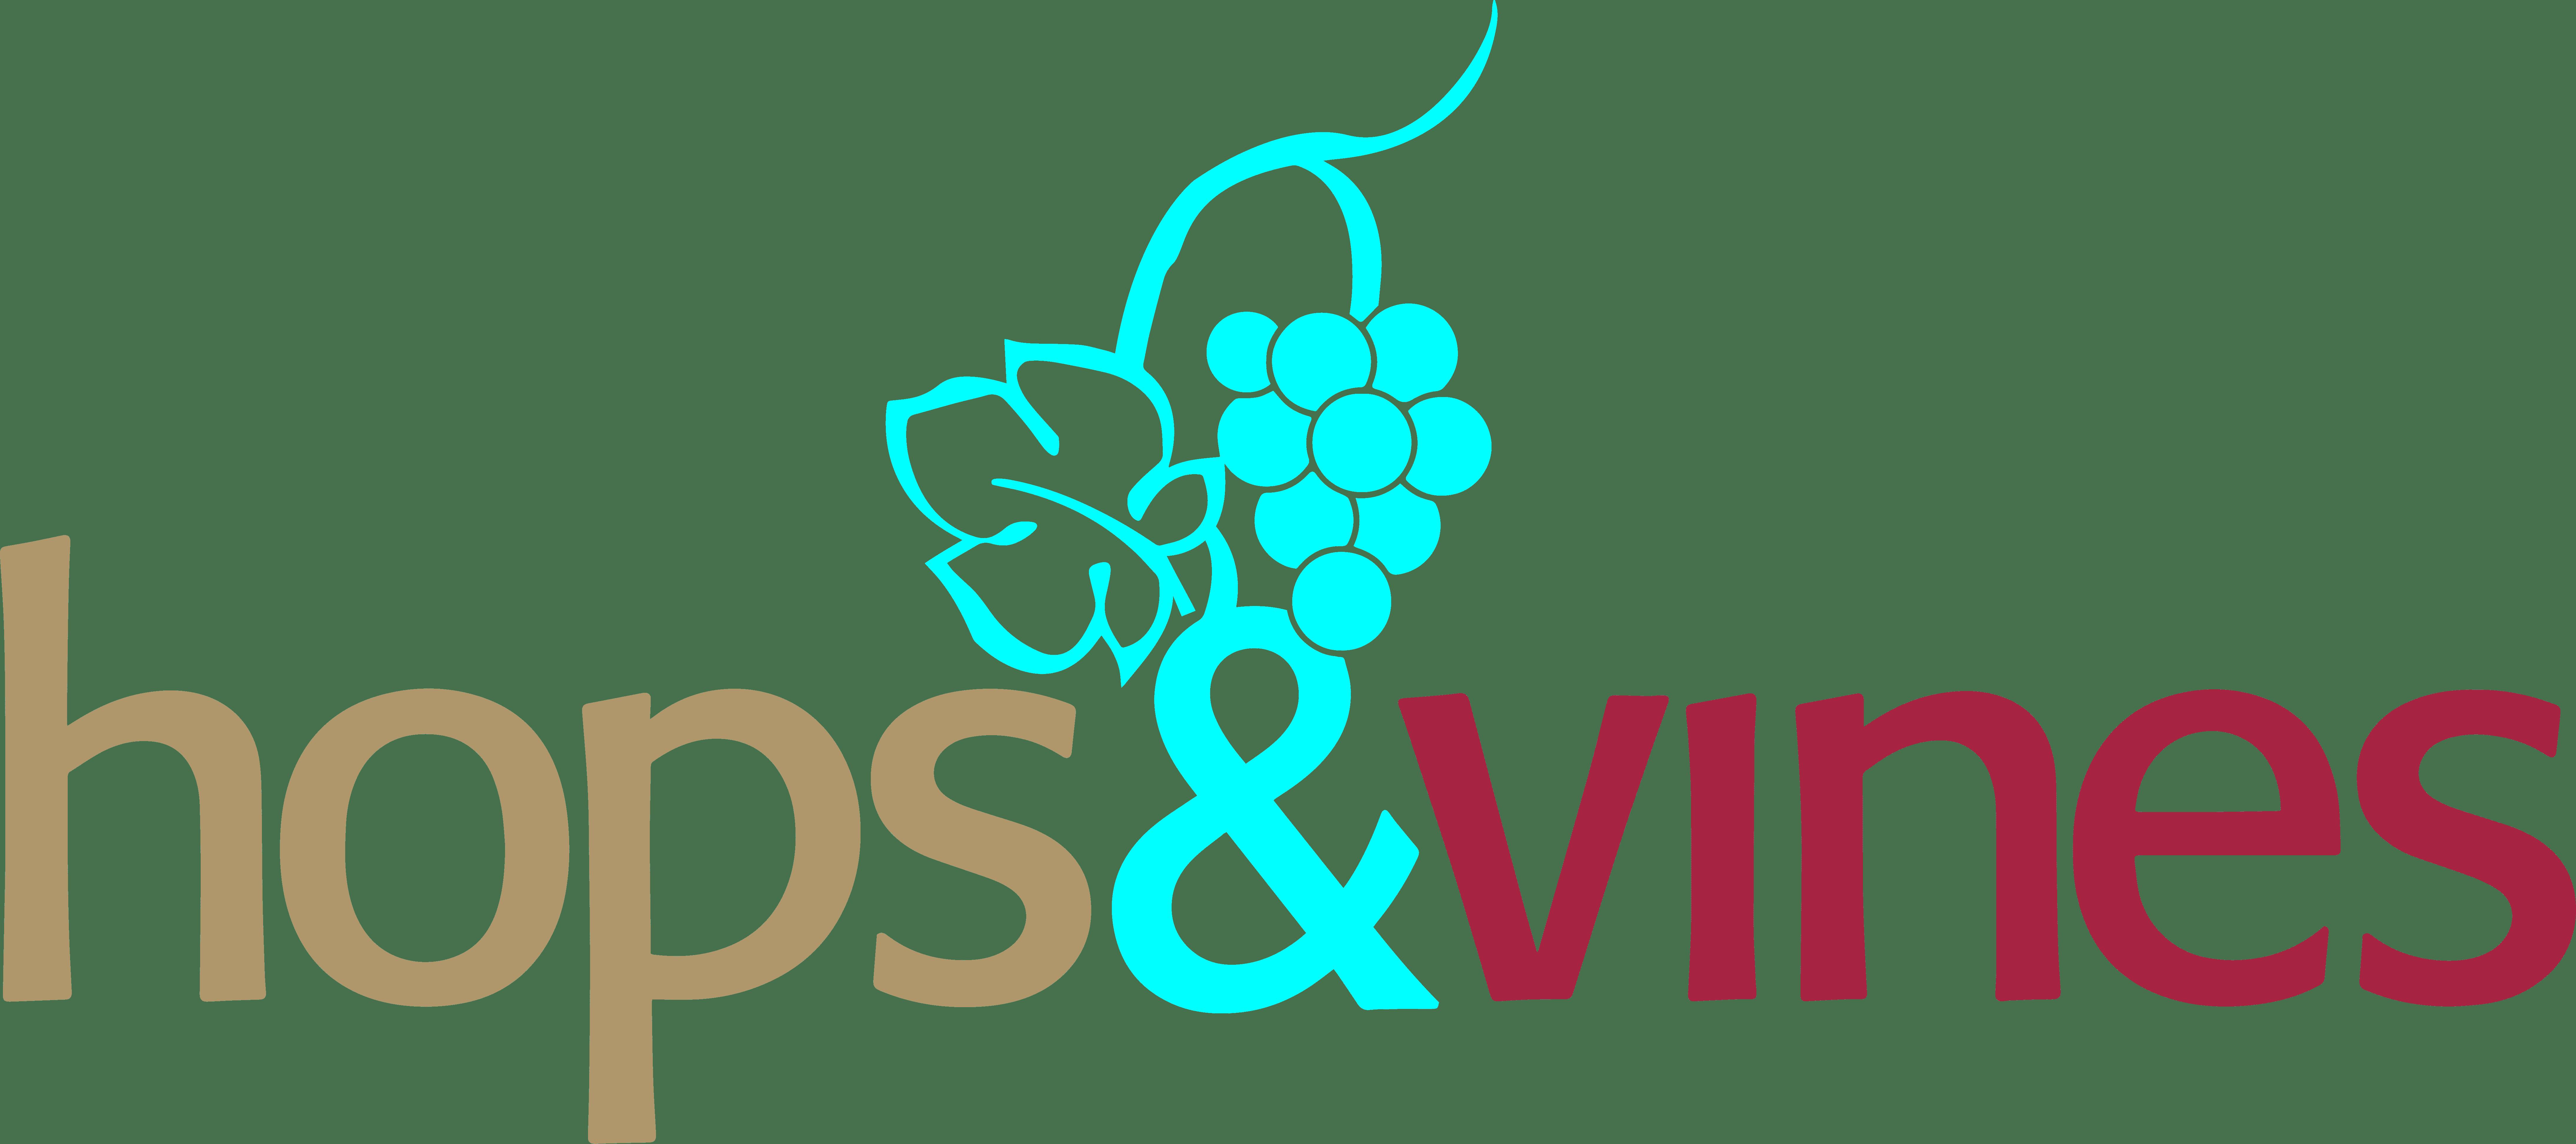 hops and vines north bay logo colour transparent 9LD